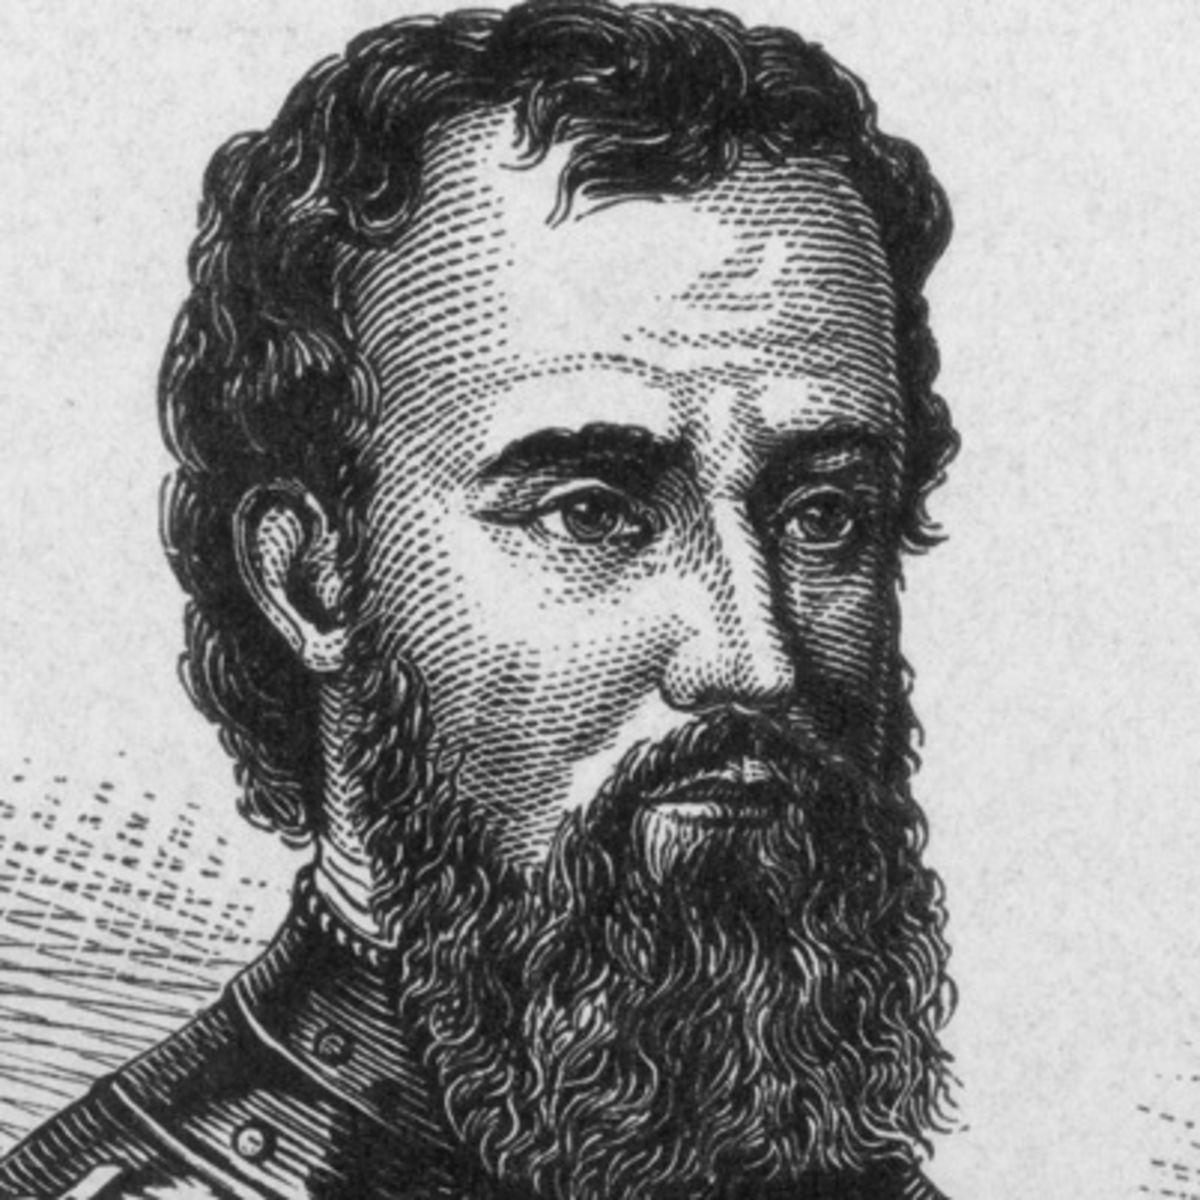 Giovanni Da Verrazzano Was An Italian Explorer Who Charted The Atlantic Coast Of North America Between The Carolina Da Vinci Painting New York Harbor Giovanni